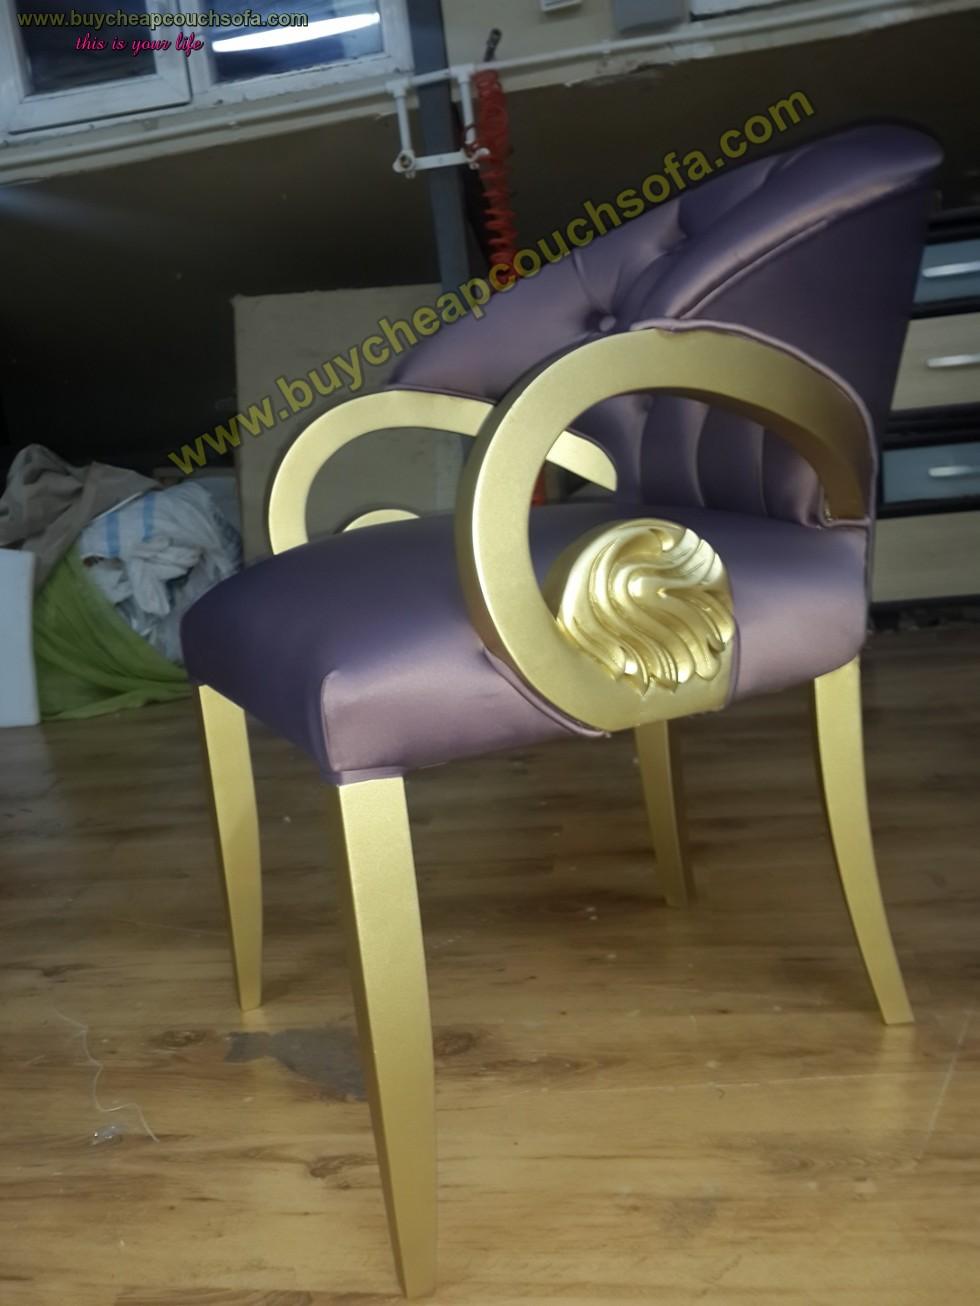 Kodu: 10231 - Purple Velvet Armchair Accent Chair Wooden Chair Tufted Luxury